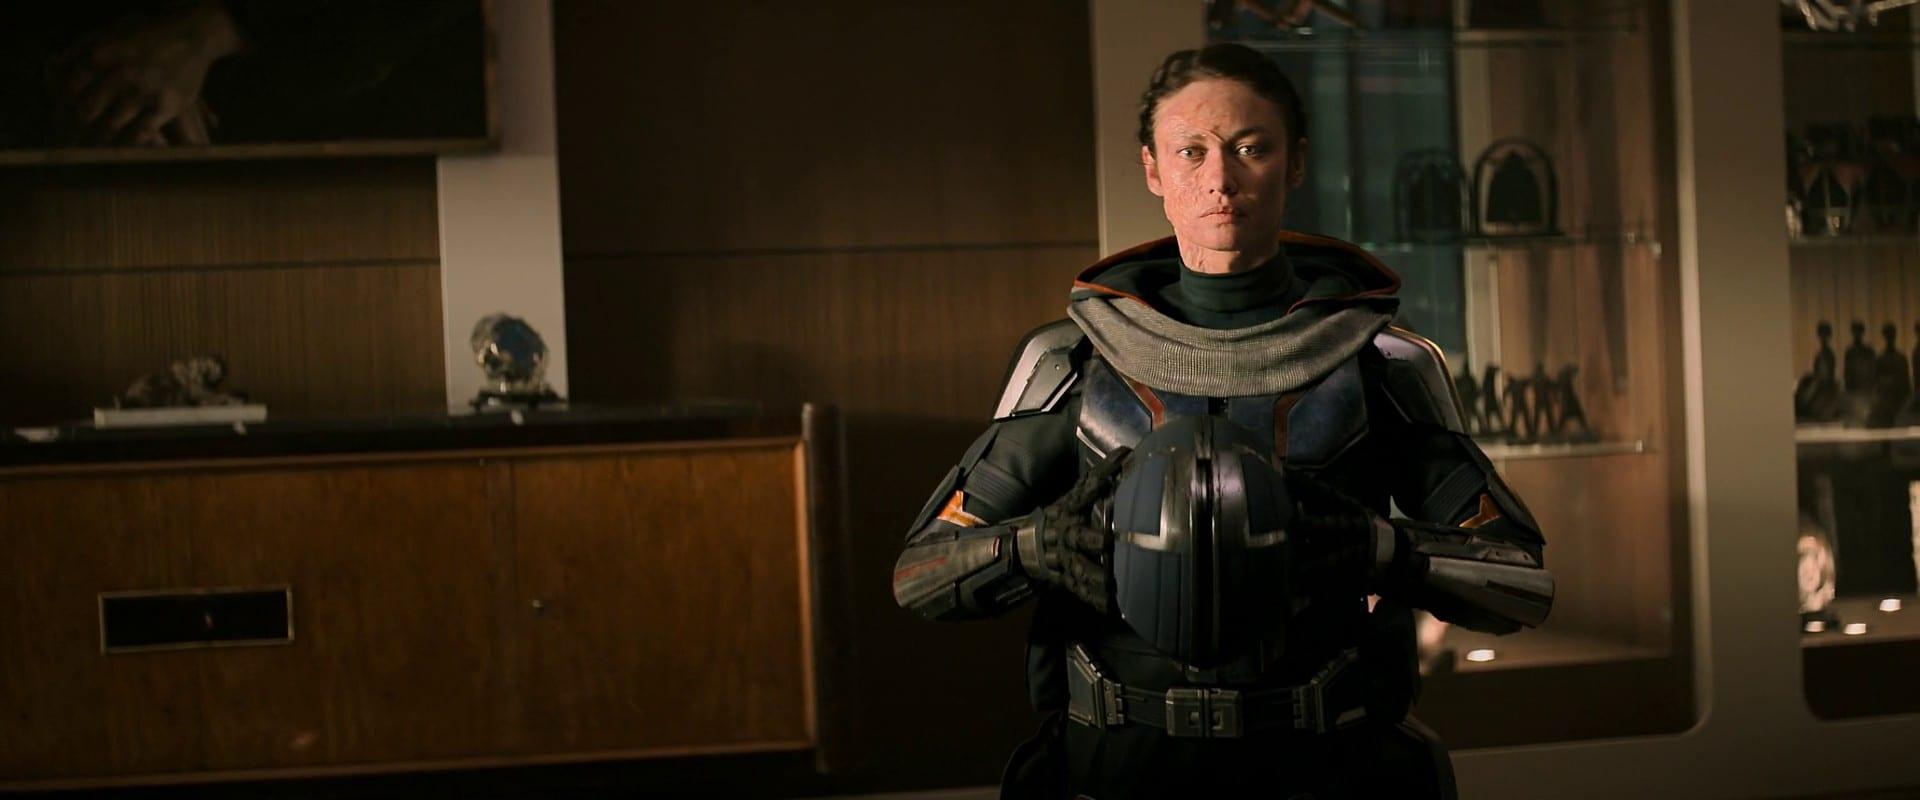 The Identity Of Taskmaster In Black Widow Revealed